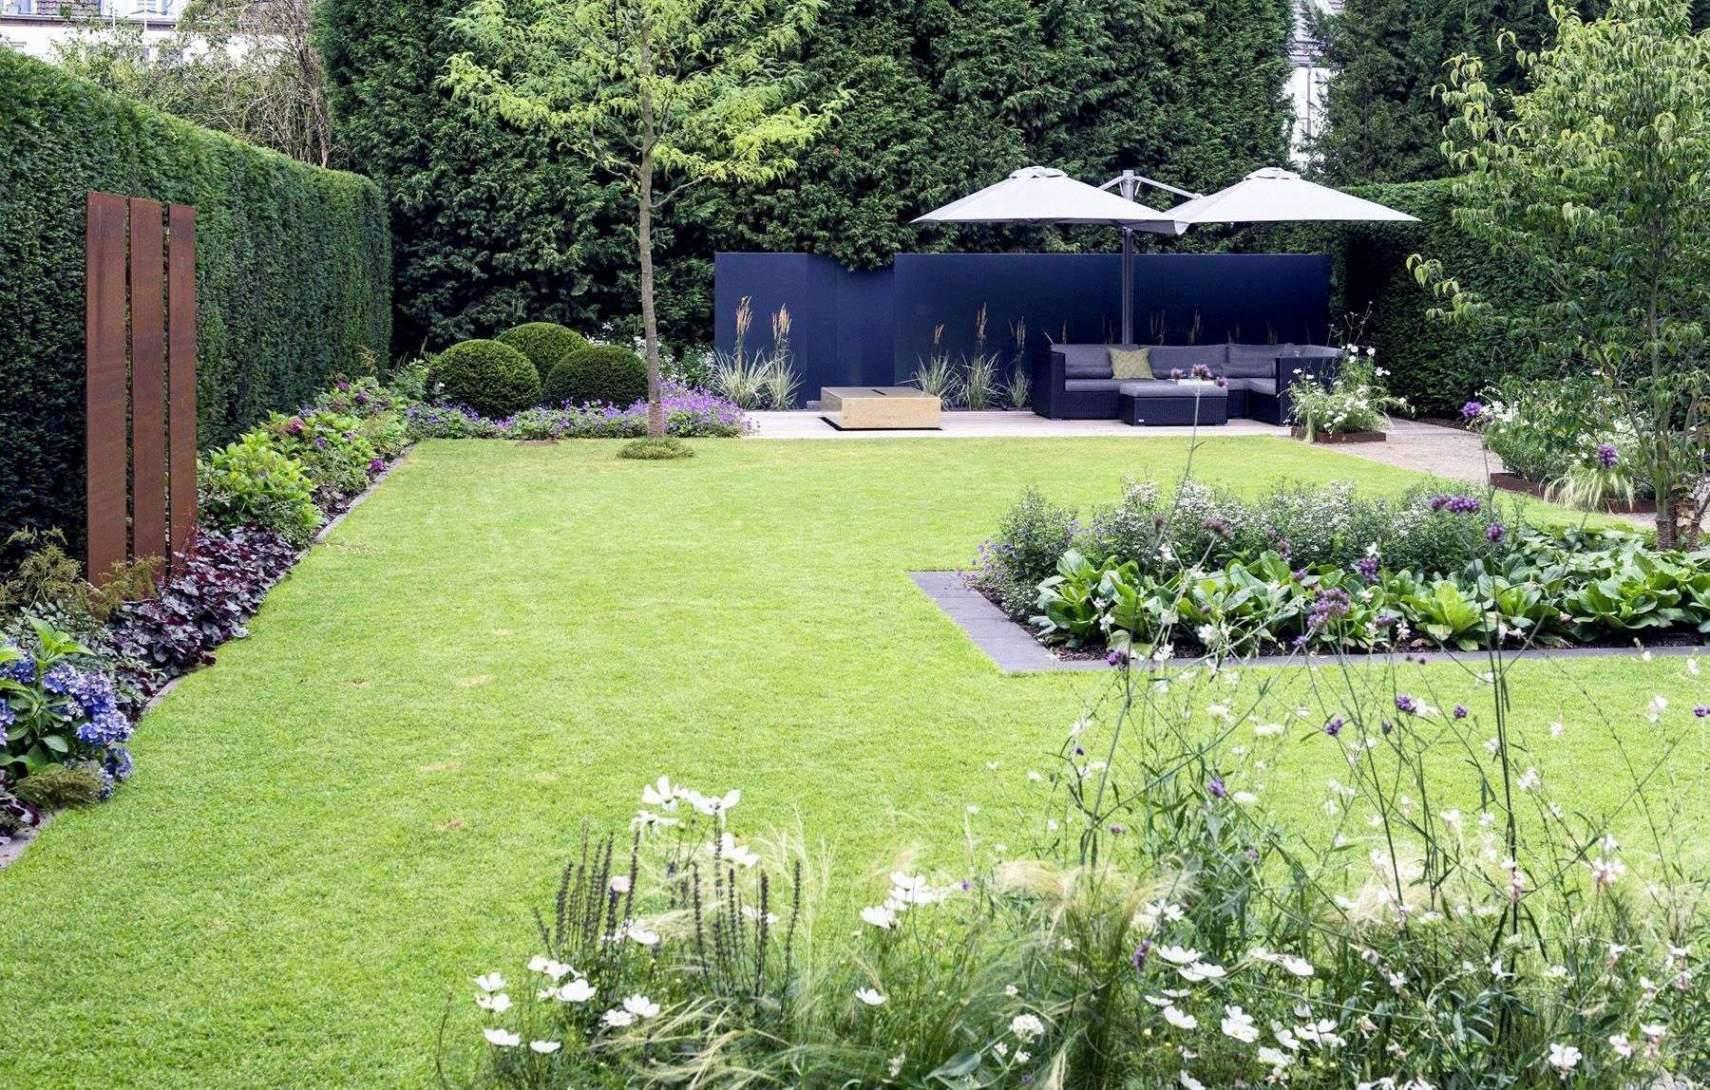 Japanischer Garten Anlegen Einzigartig 27 Neu Garten Gestalten